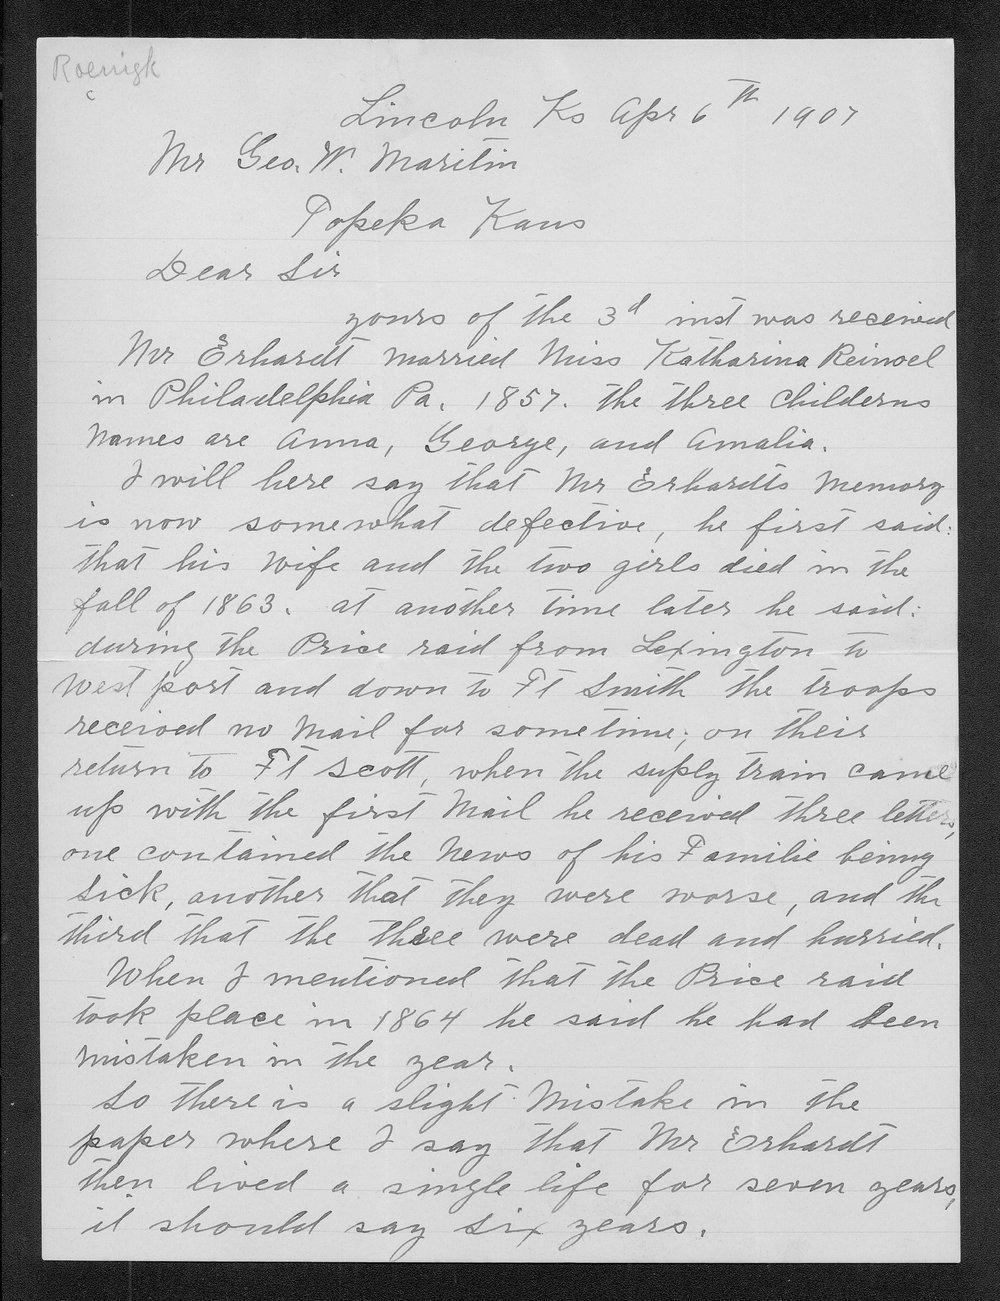 A. Roenigk to George W. Martin - 1